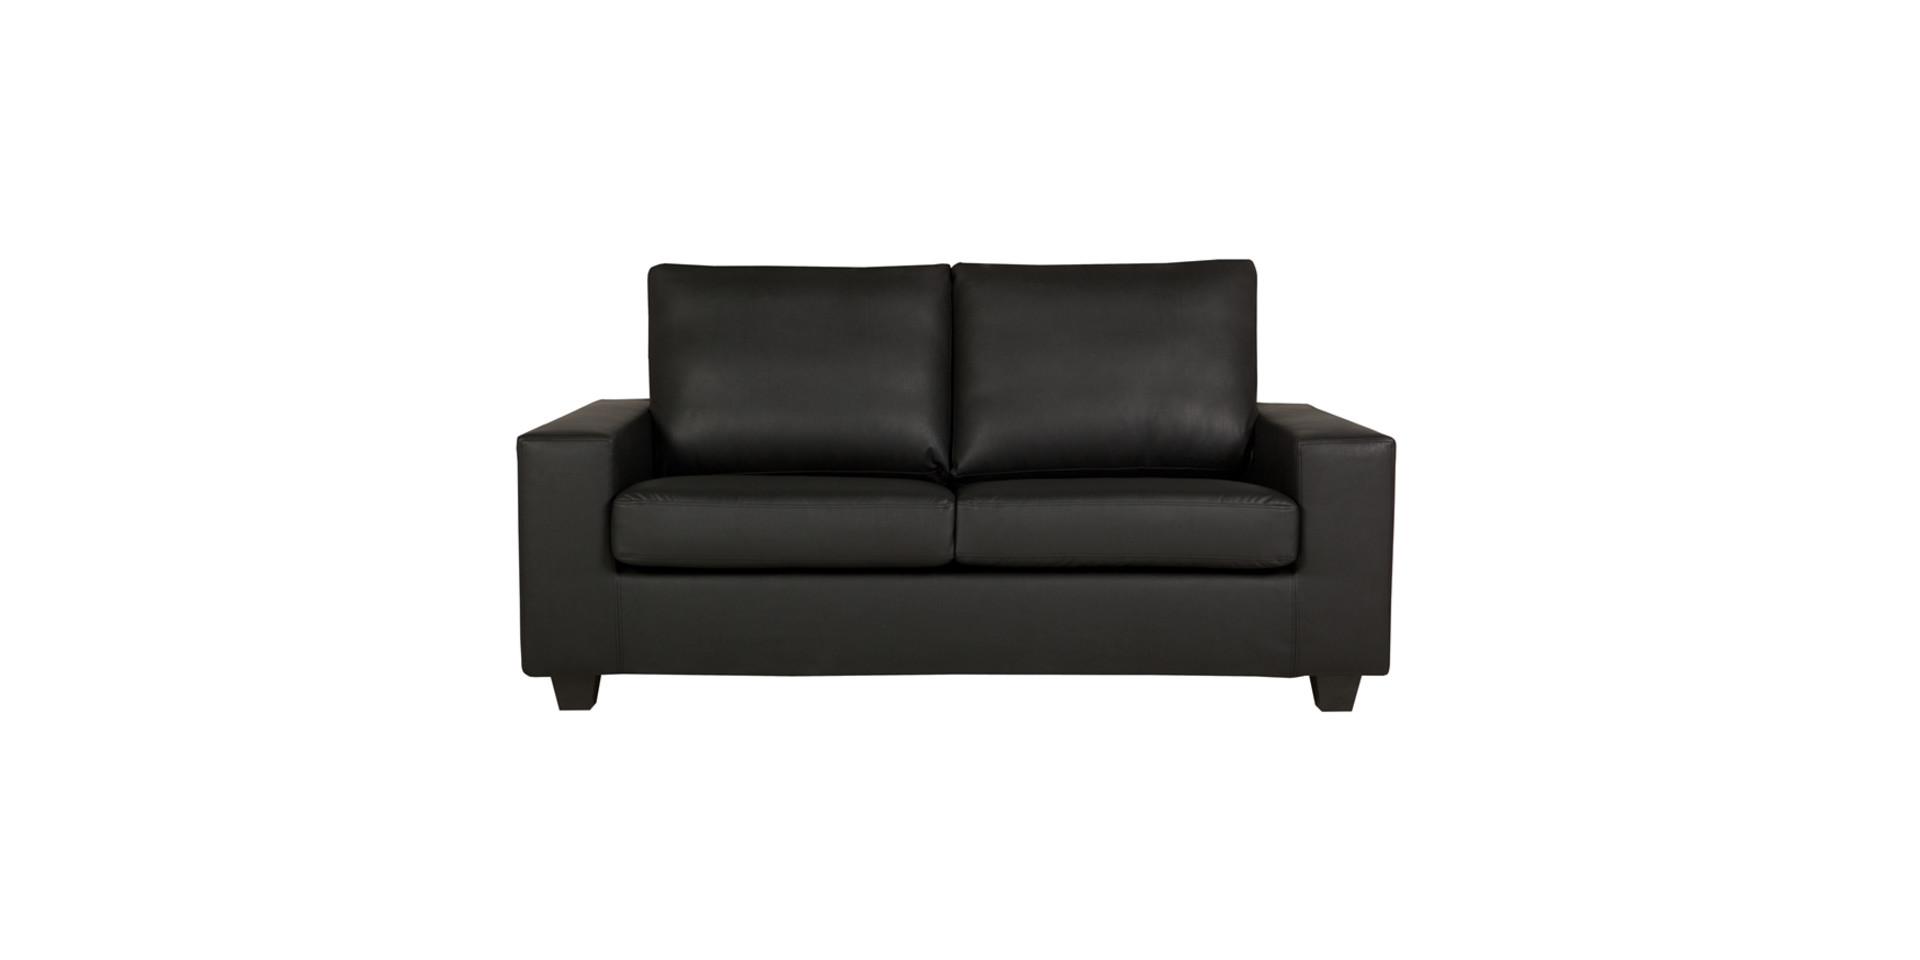 sits quick canap s angles poufs canap avenue. Black Bedroom Furniture Sets. Home Design Ideas